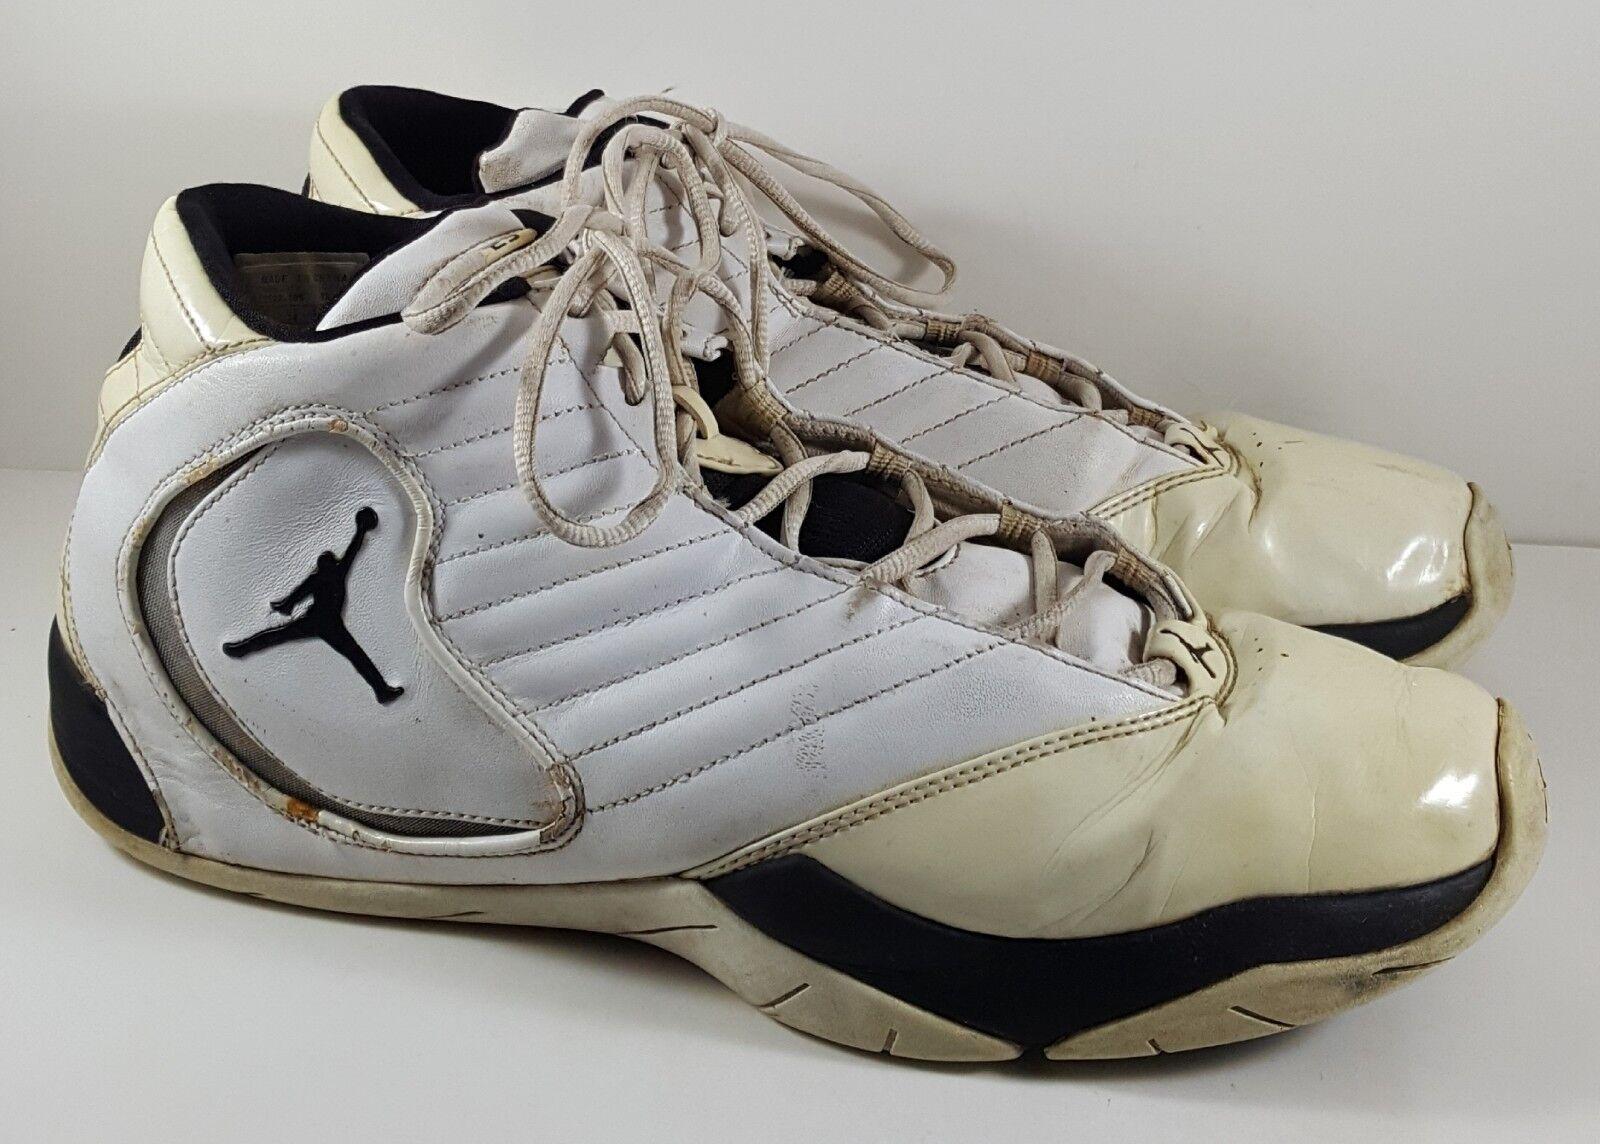 new arrival b4f6b ccf5b Nike Nike Nike Air Jordan B 2 Rue- White Black Silver Size 15